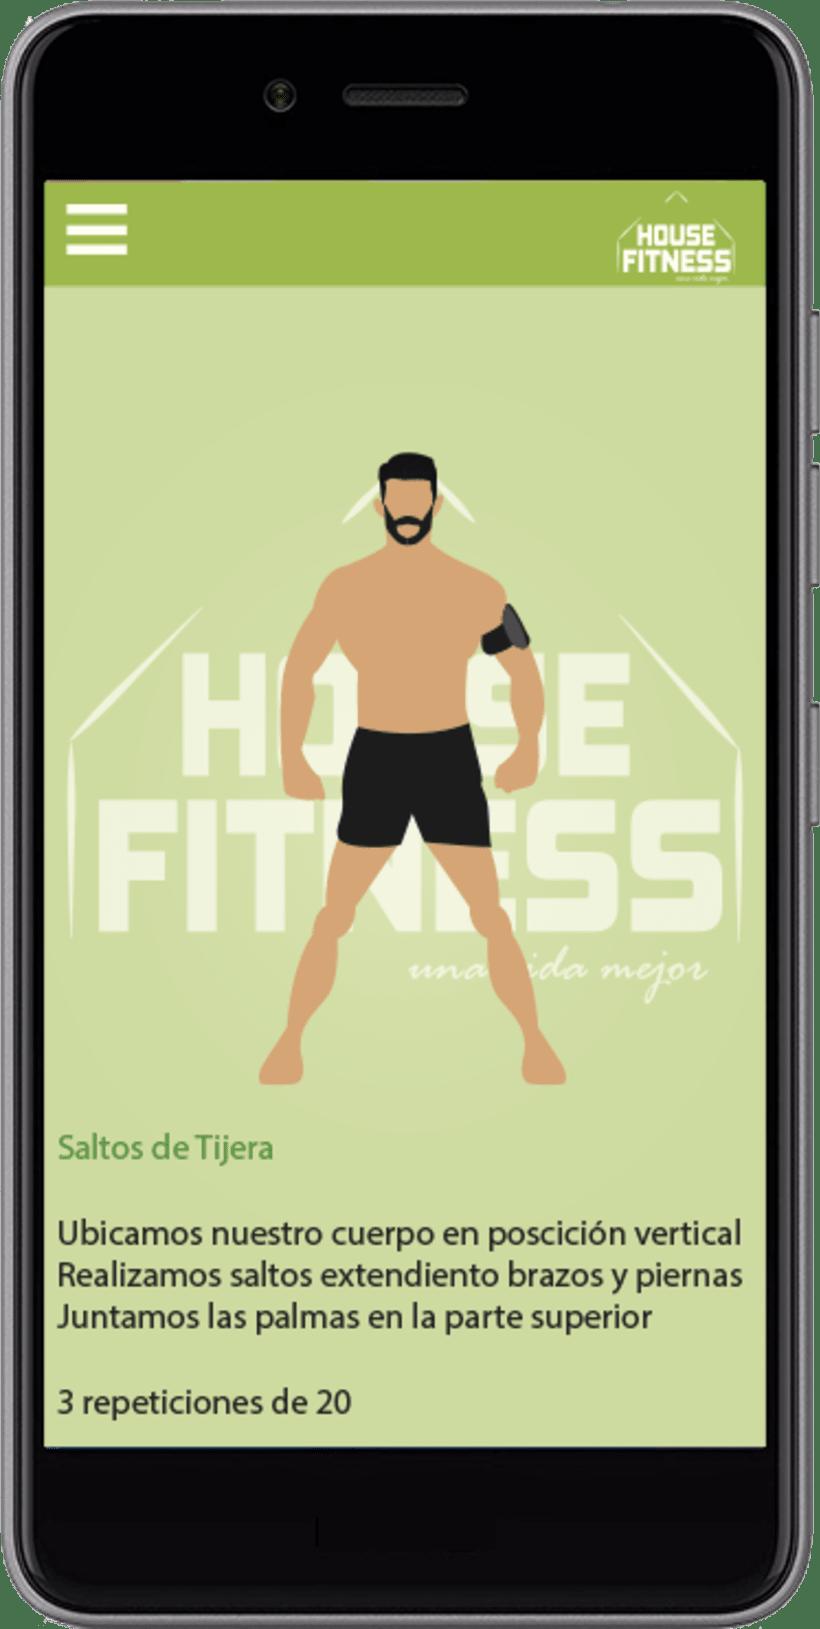 Desarollo de App House Fitness 3